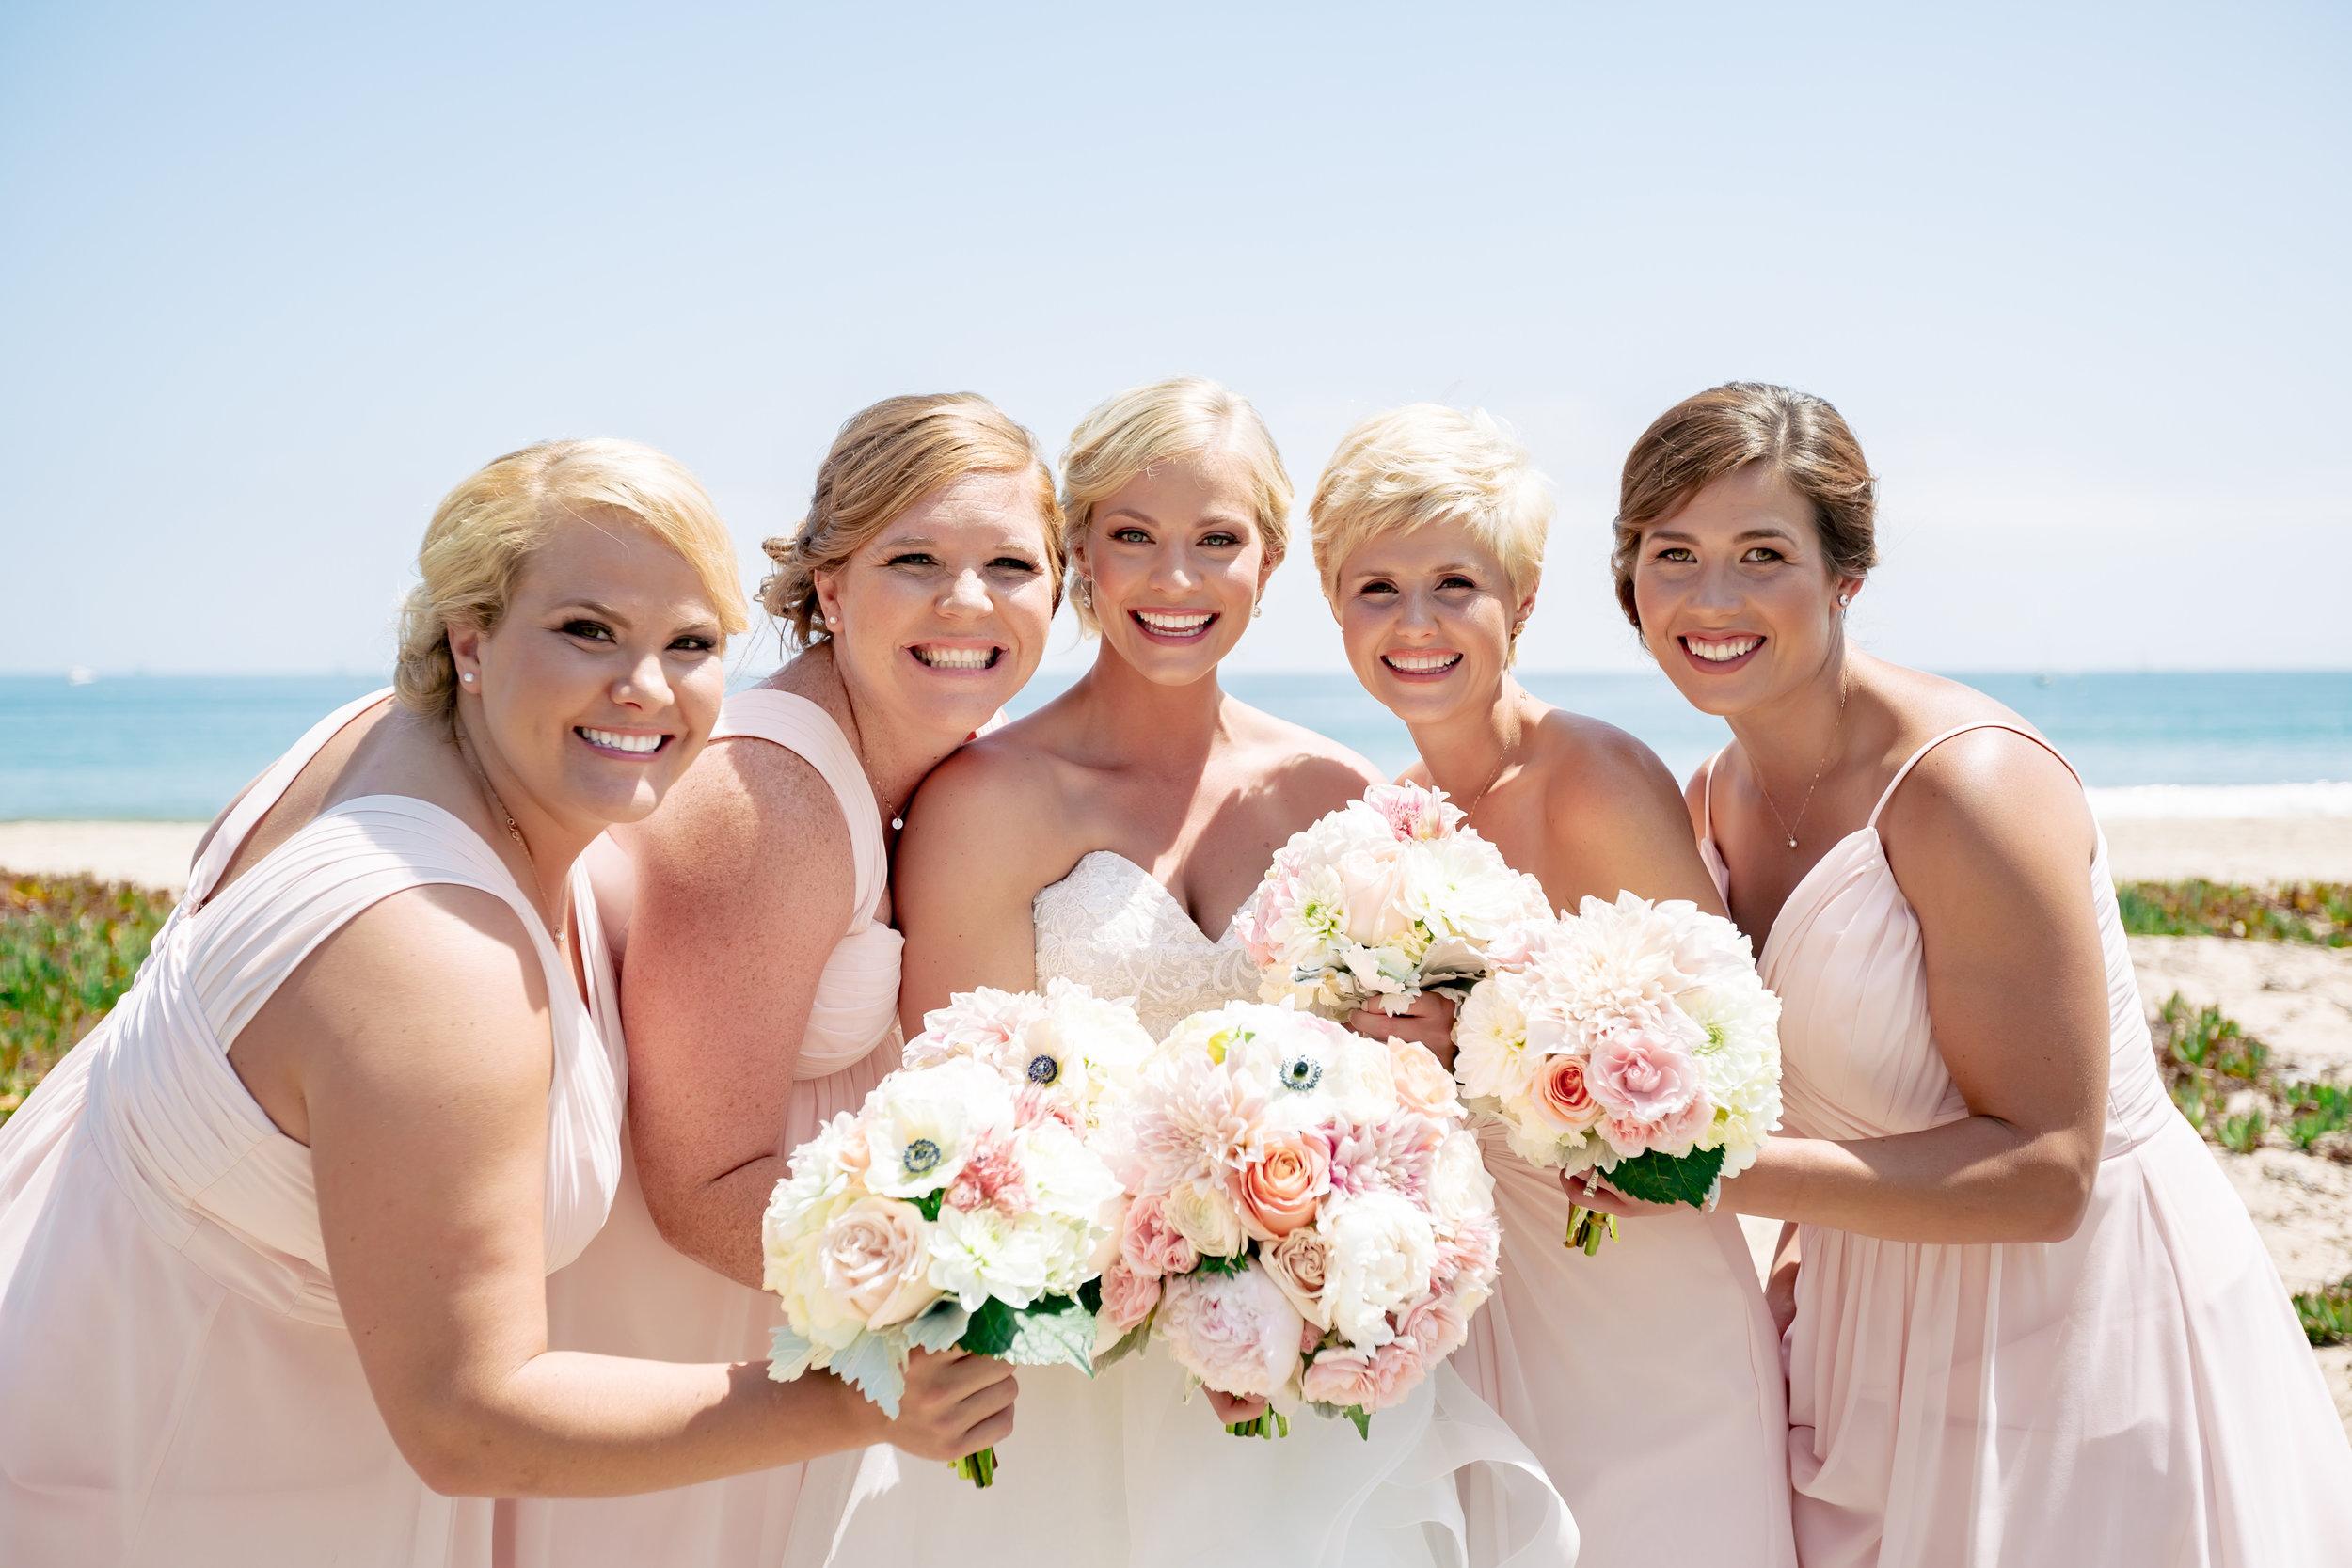 www.santabarbarawedding.com   Rewind Photography   Hilton Santa Barbara Beachfront Resort   Events by M and M   Bridesmaids